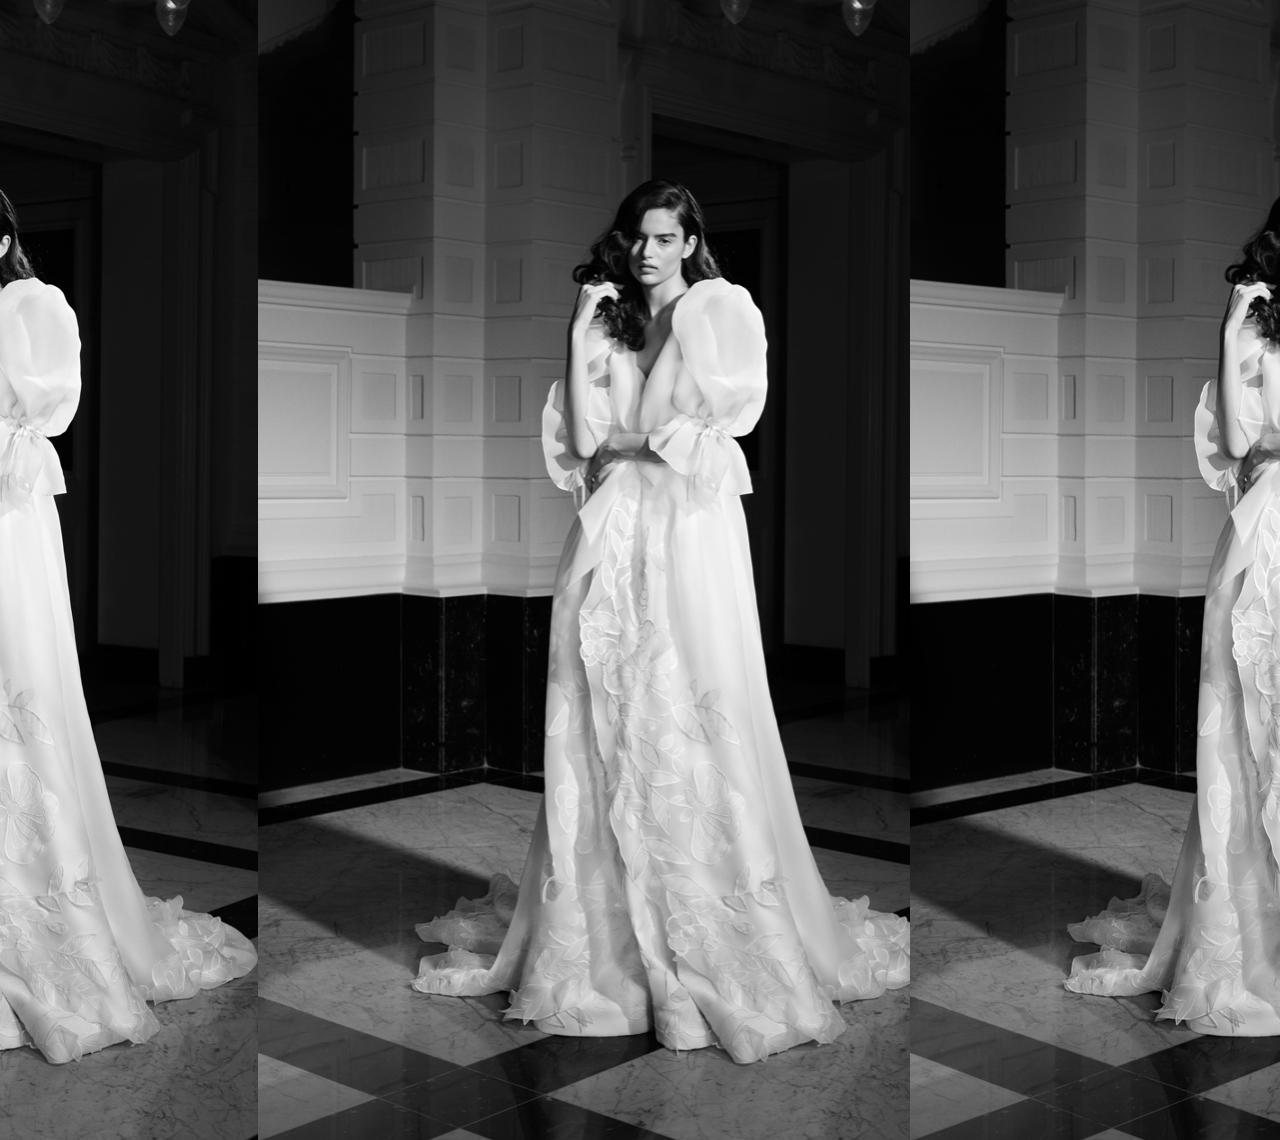 Vestidos de novia Viktor & Rolf 2022: Drama, glamour y arte a partes iguales